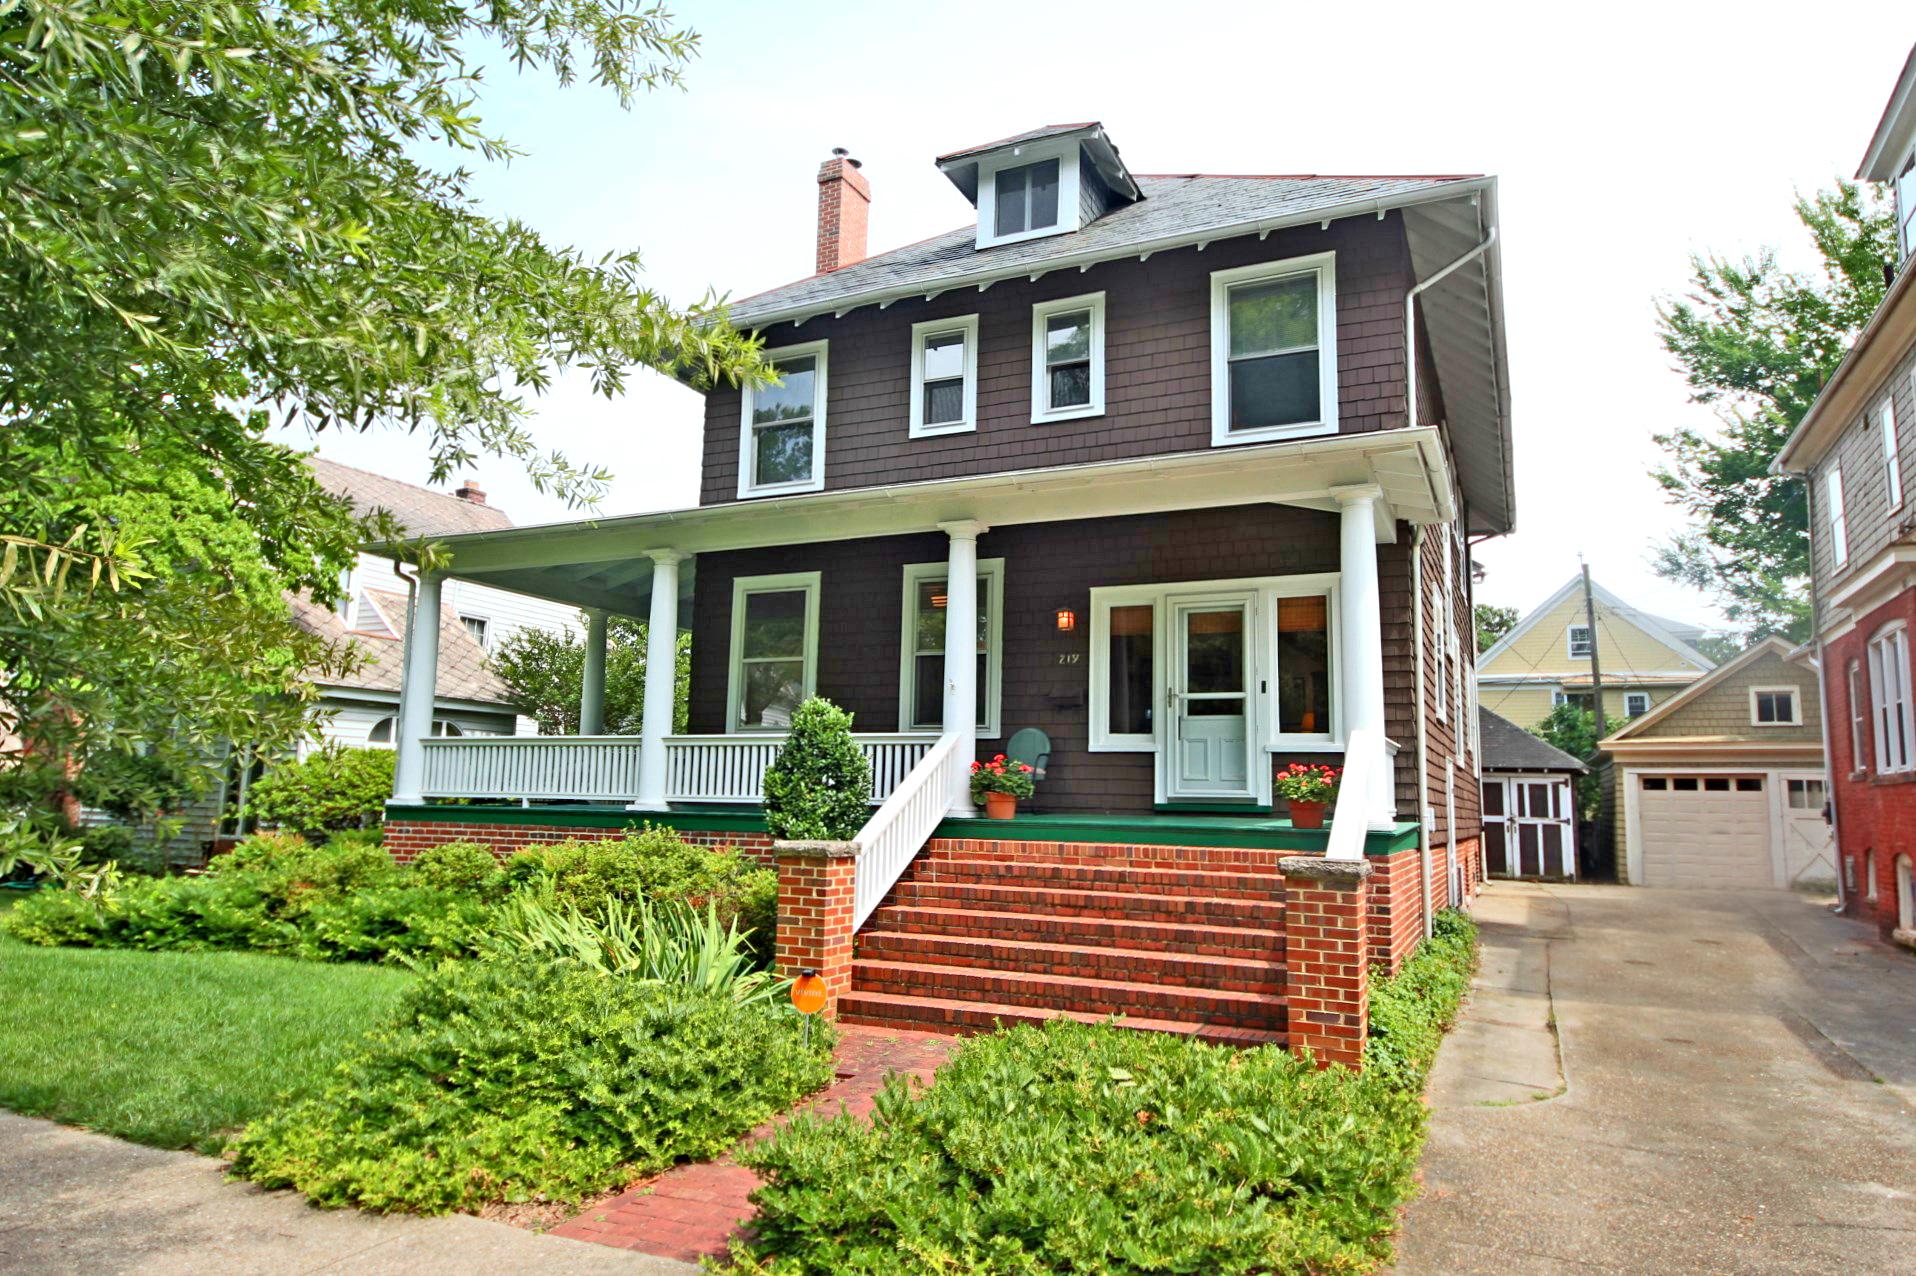 219 E 39th Street: Sold!